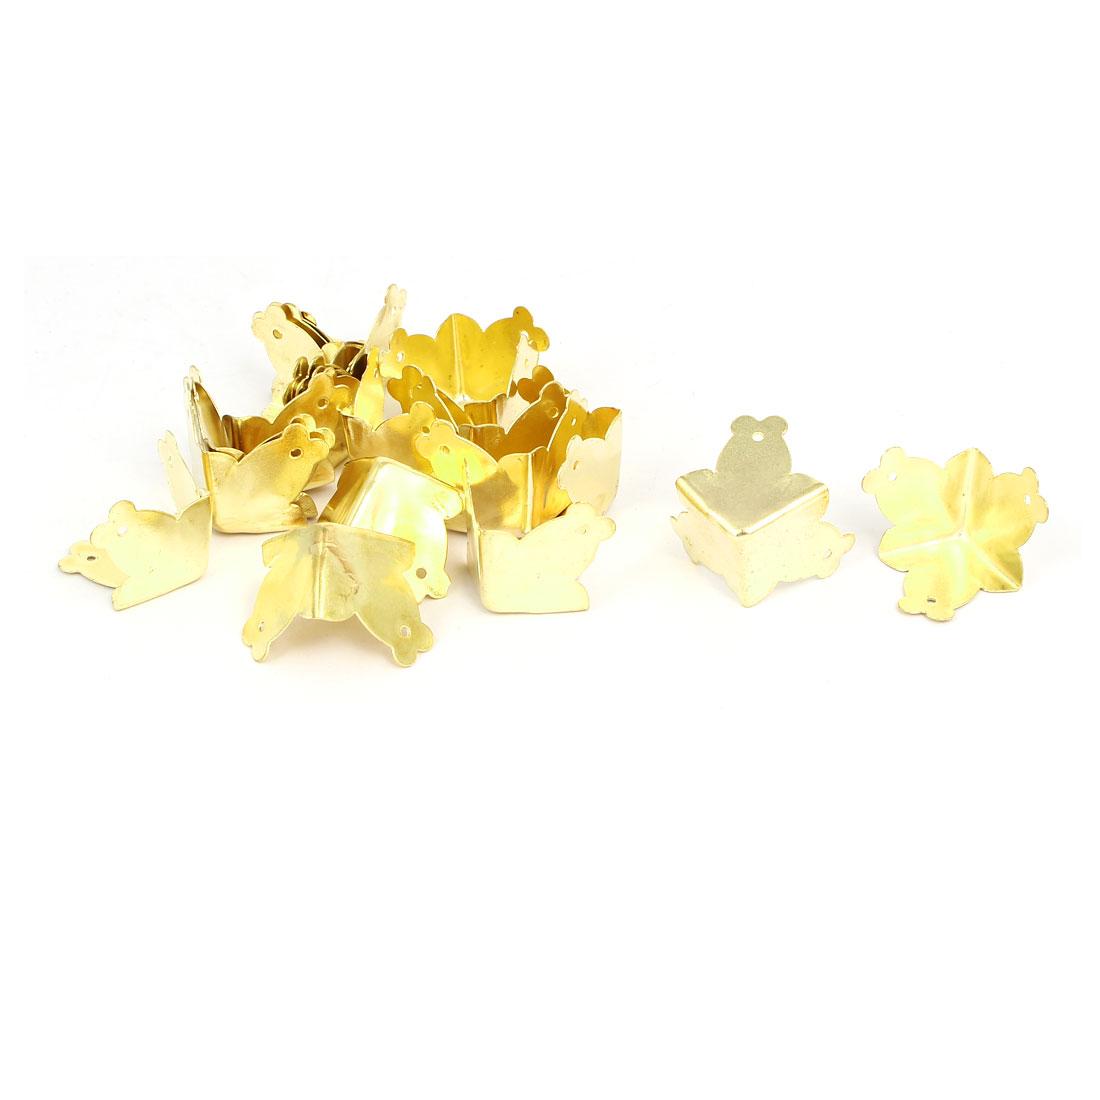 Jewelry Wine Box 3 Holes Fixed Three Sides Corner Protectors Gold Tone 20pcs